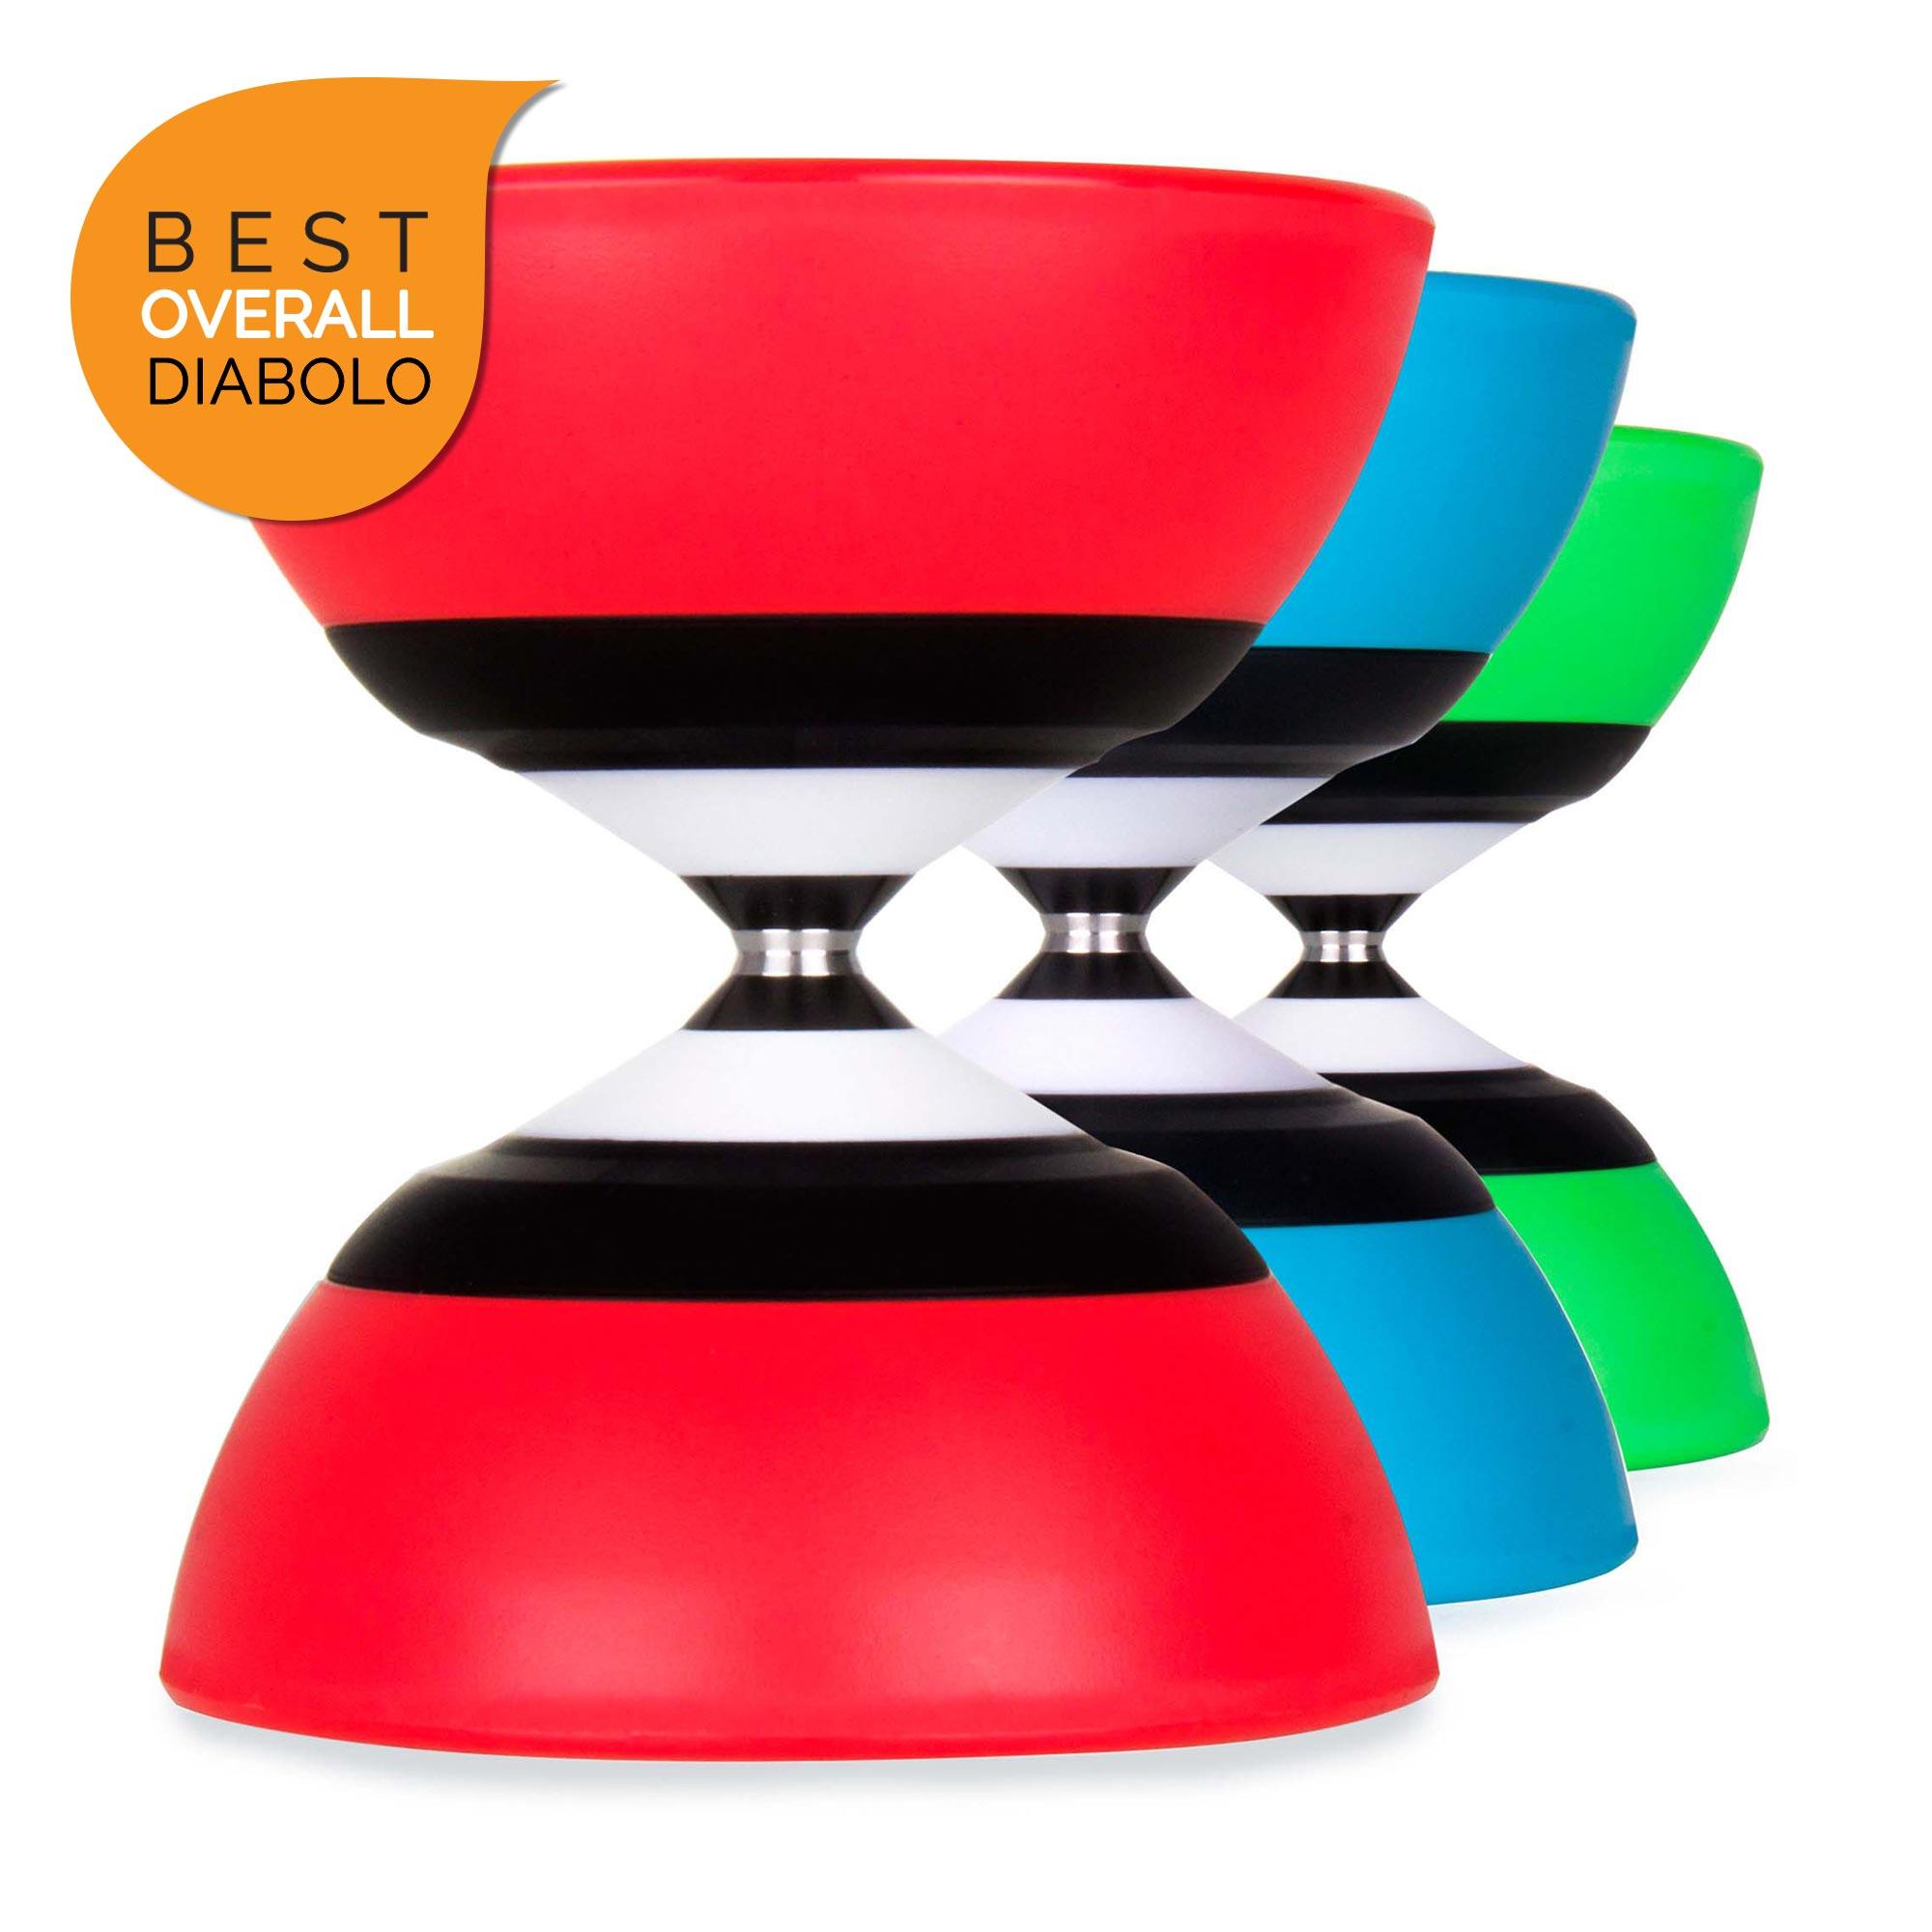 Sundia Evolution Diabolo - The Best Large Fixed Axle Diabolo